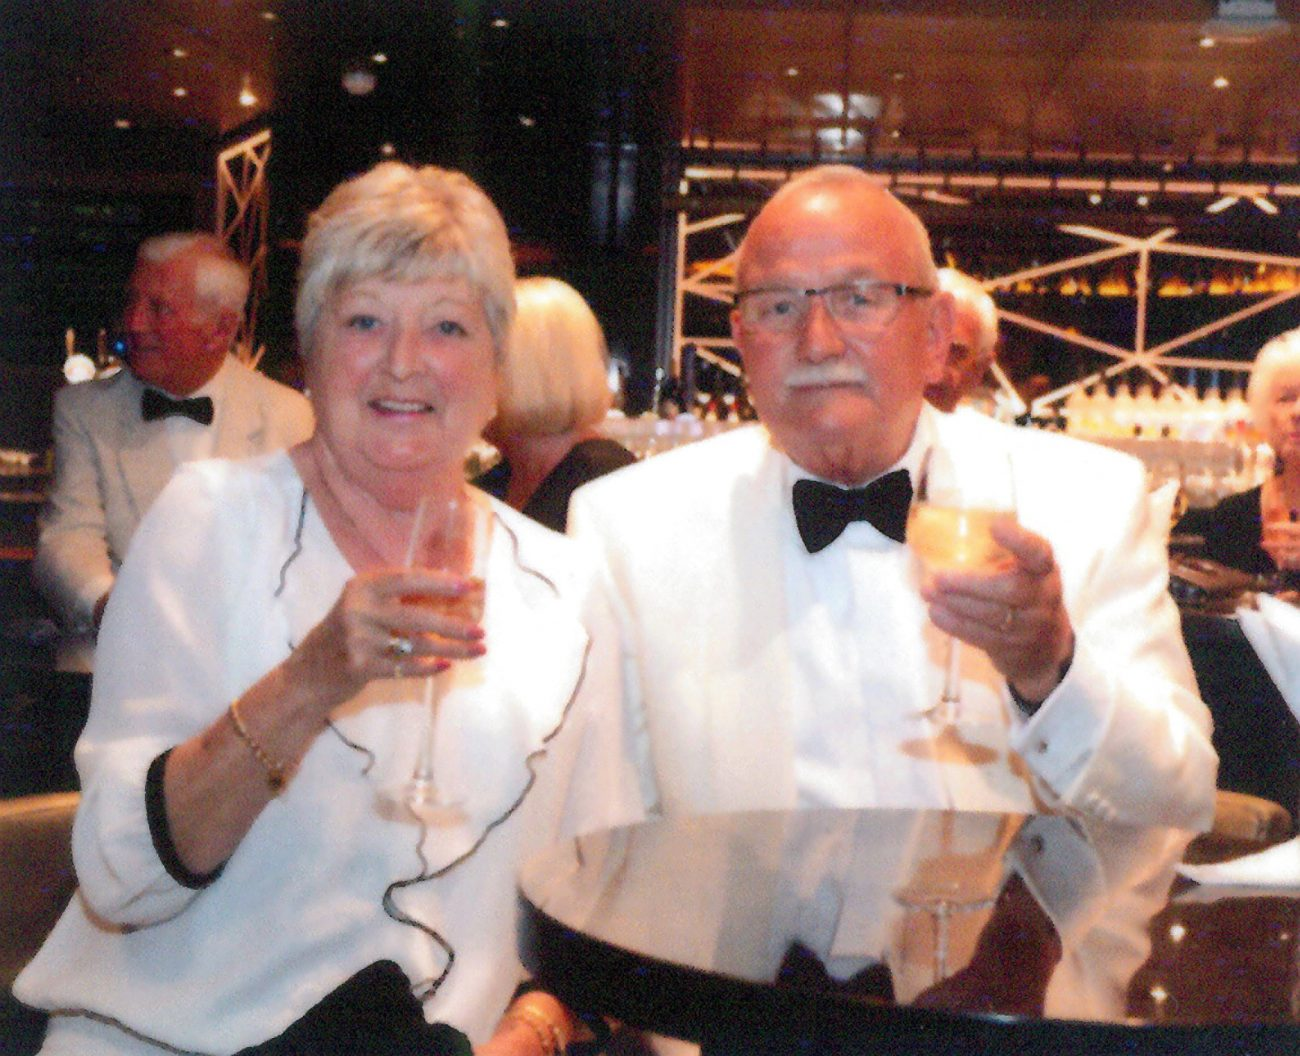 Over 70's Couple Keep on Cruising